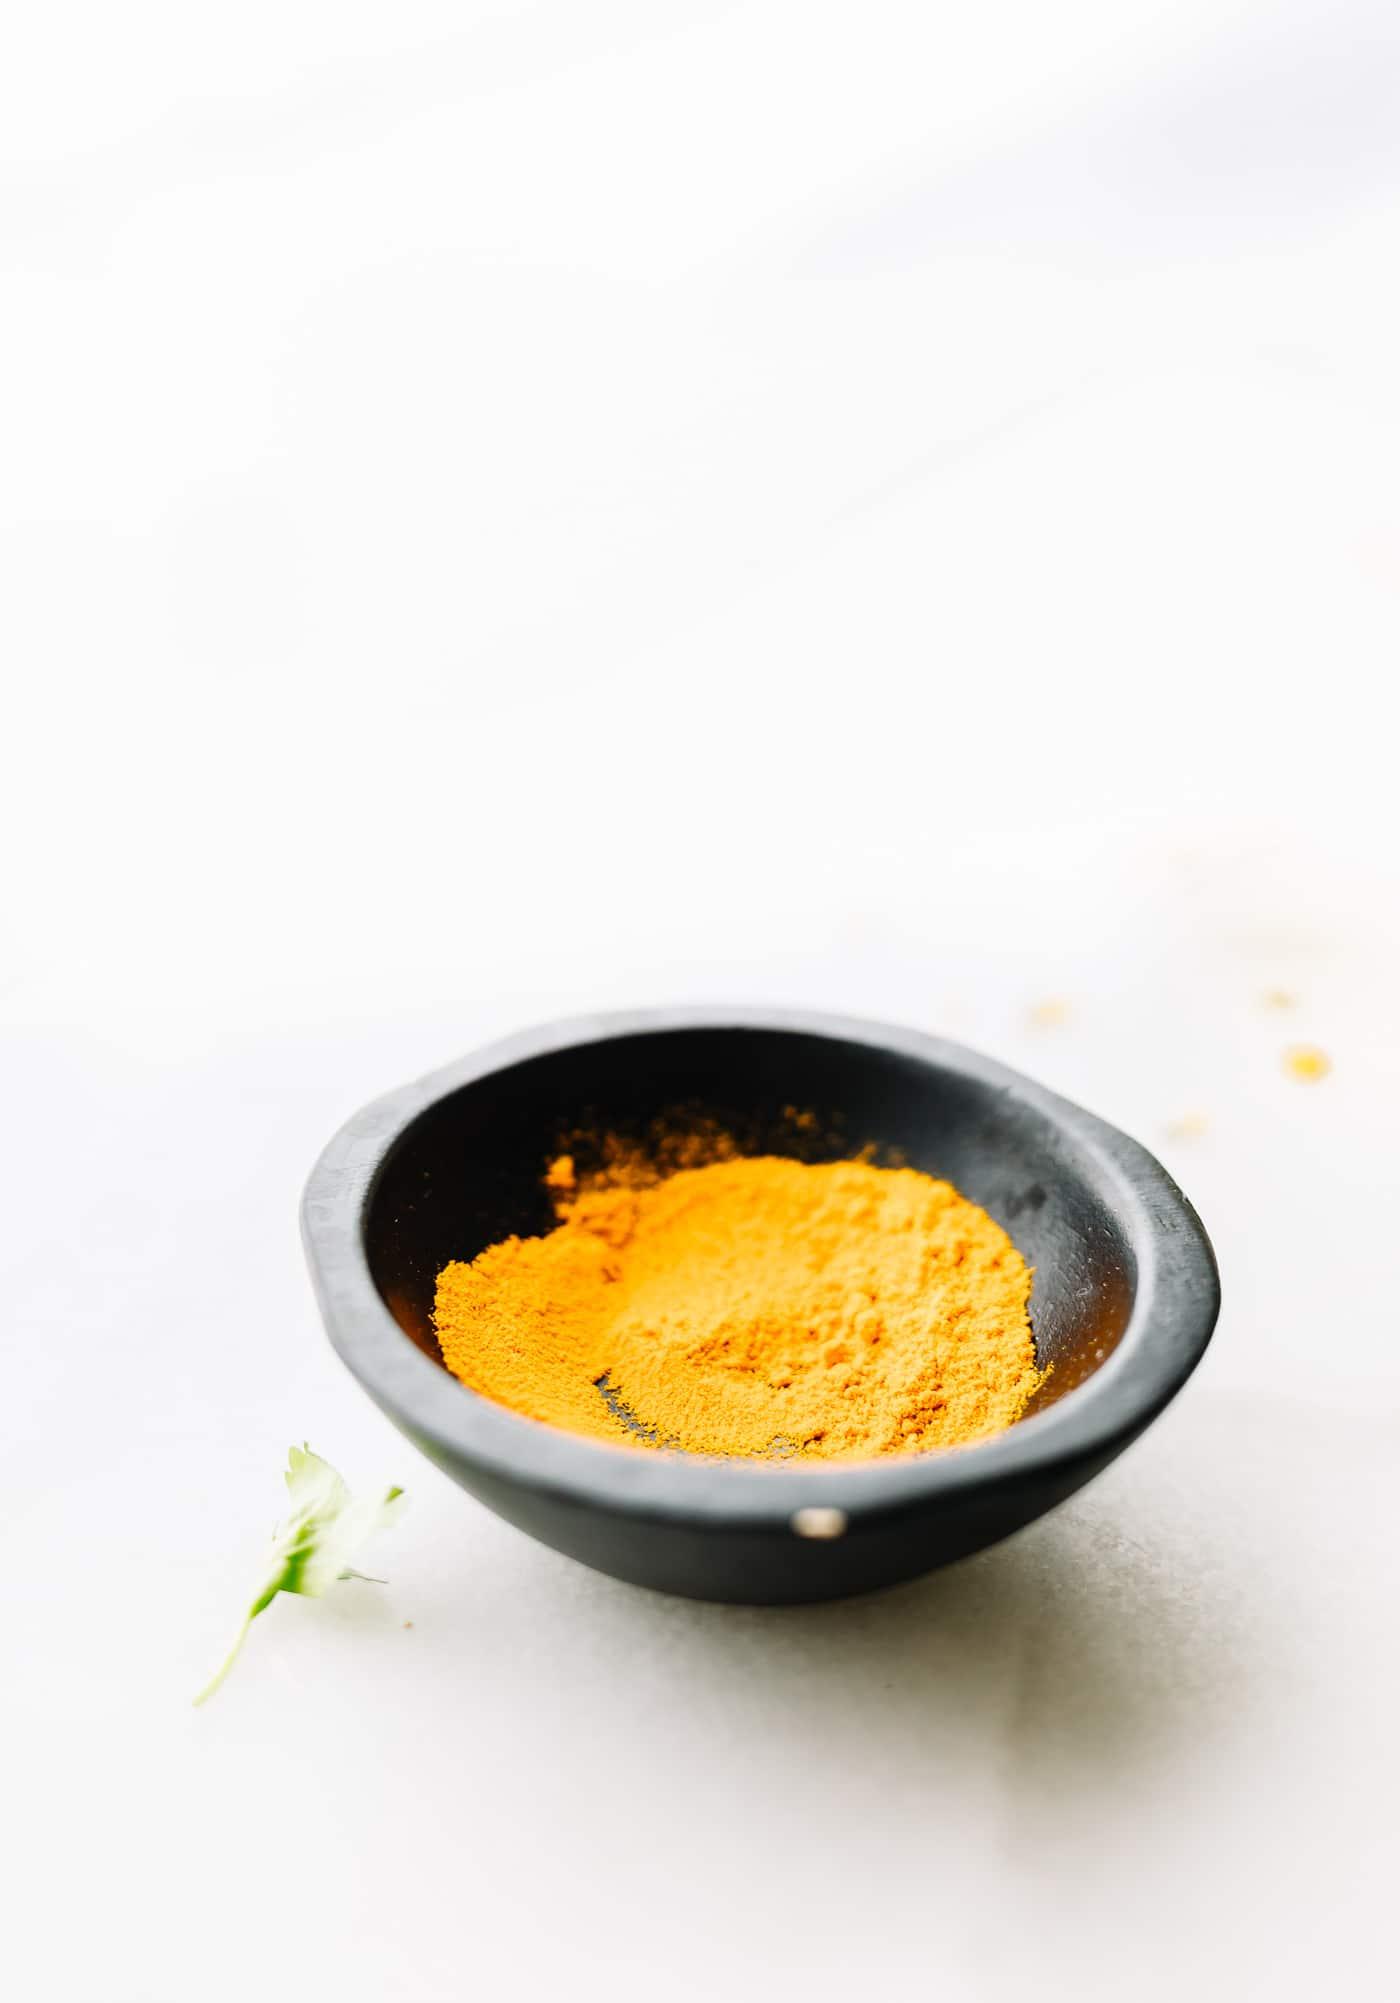 dish of curry powder